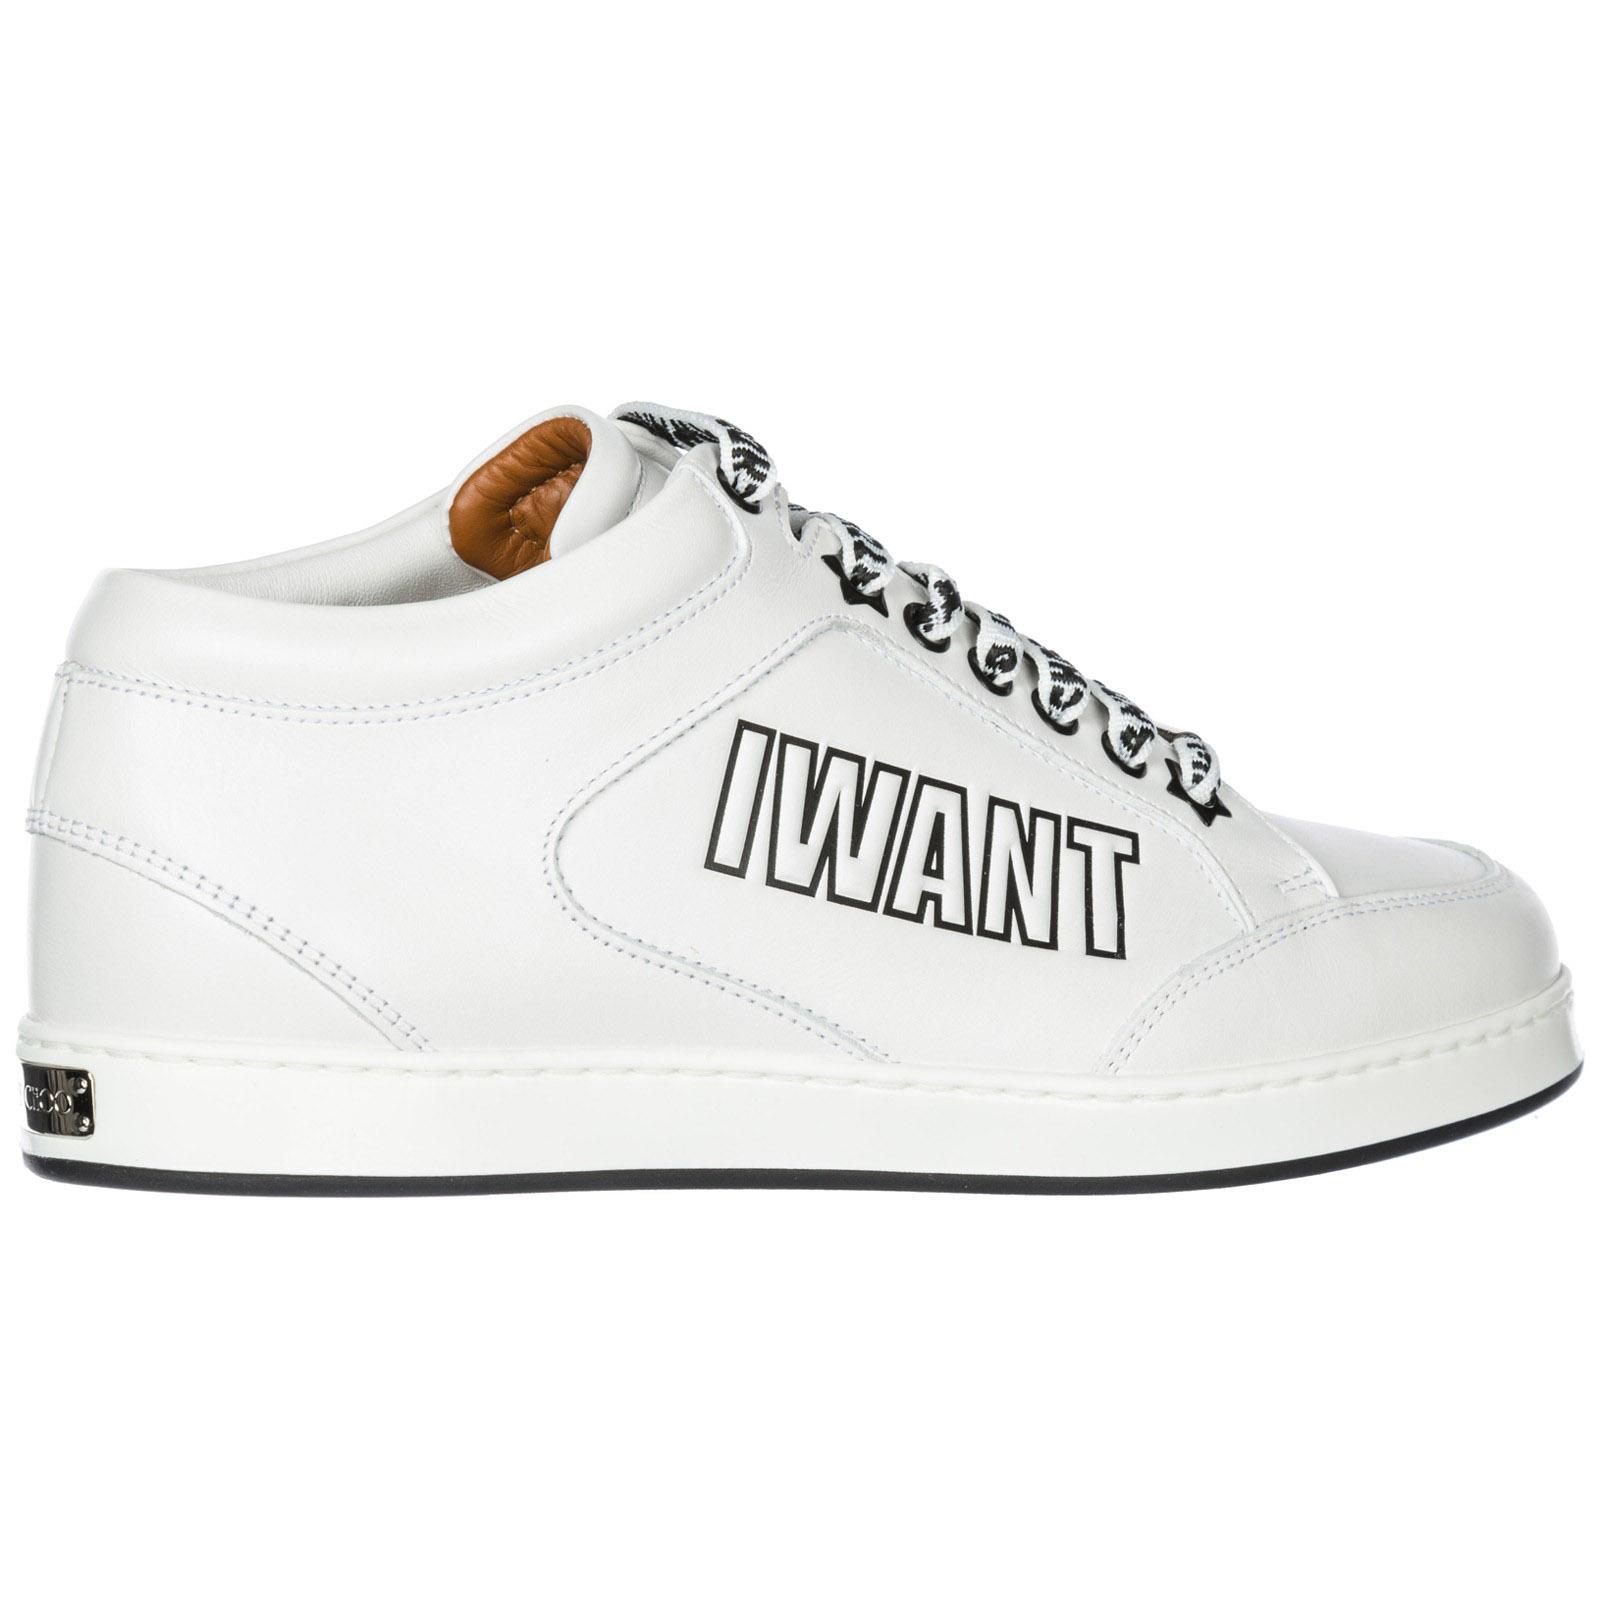 Sneakers Jimmy Choo miami